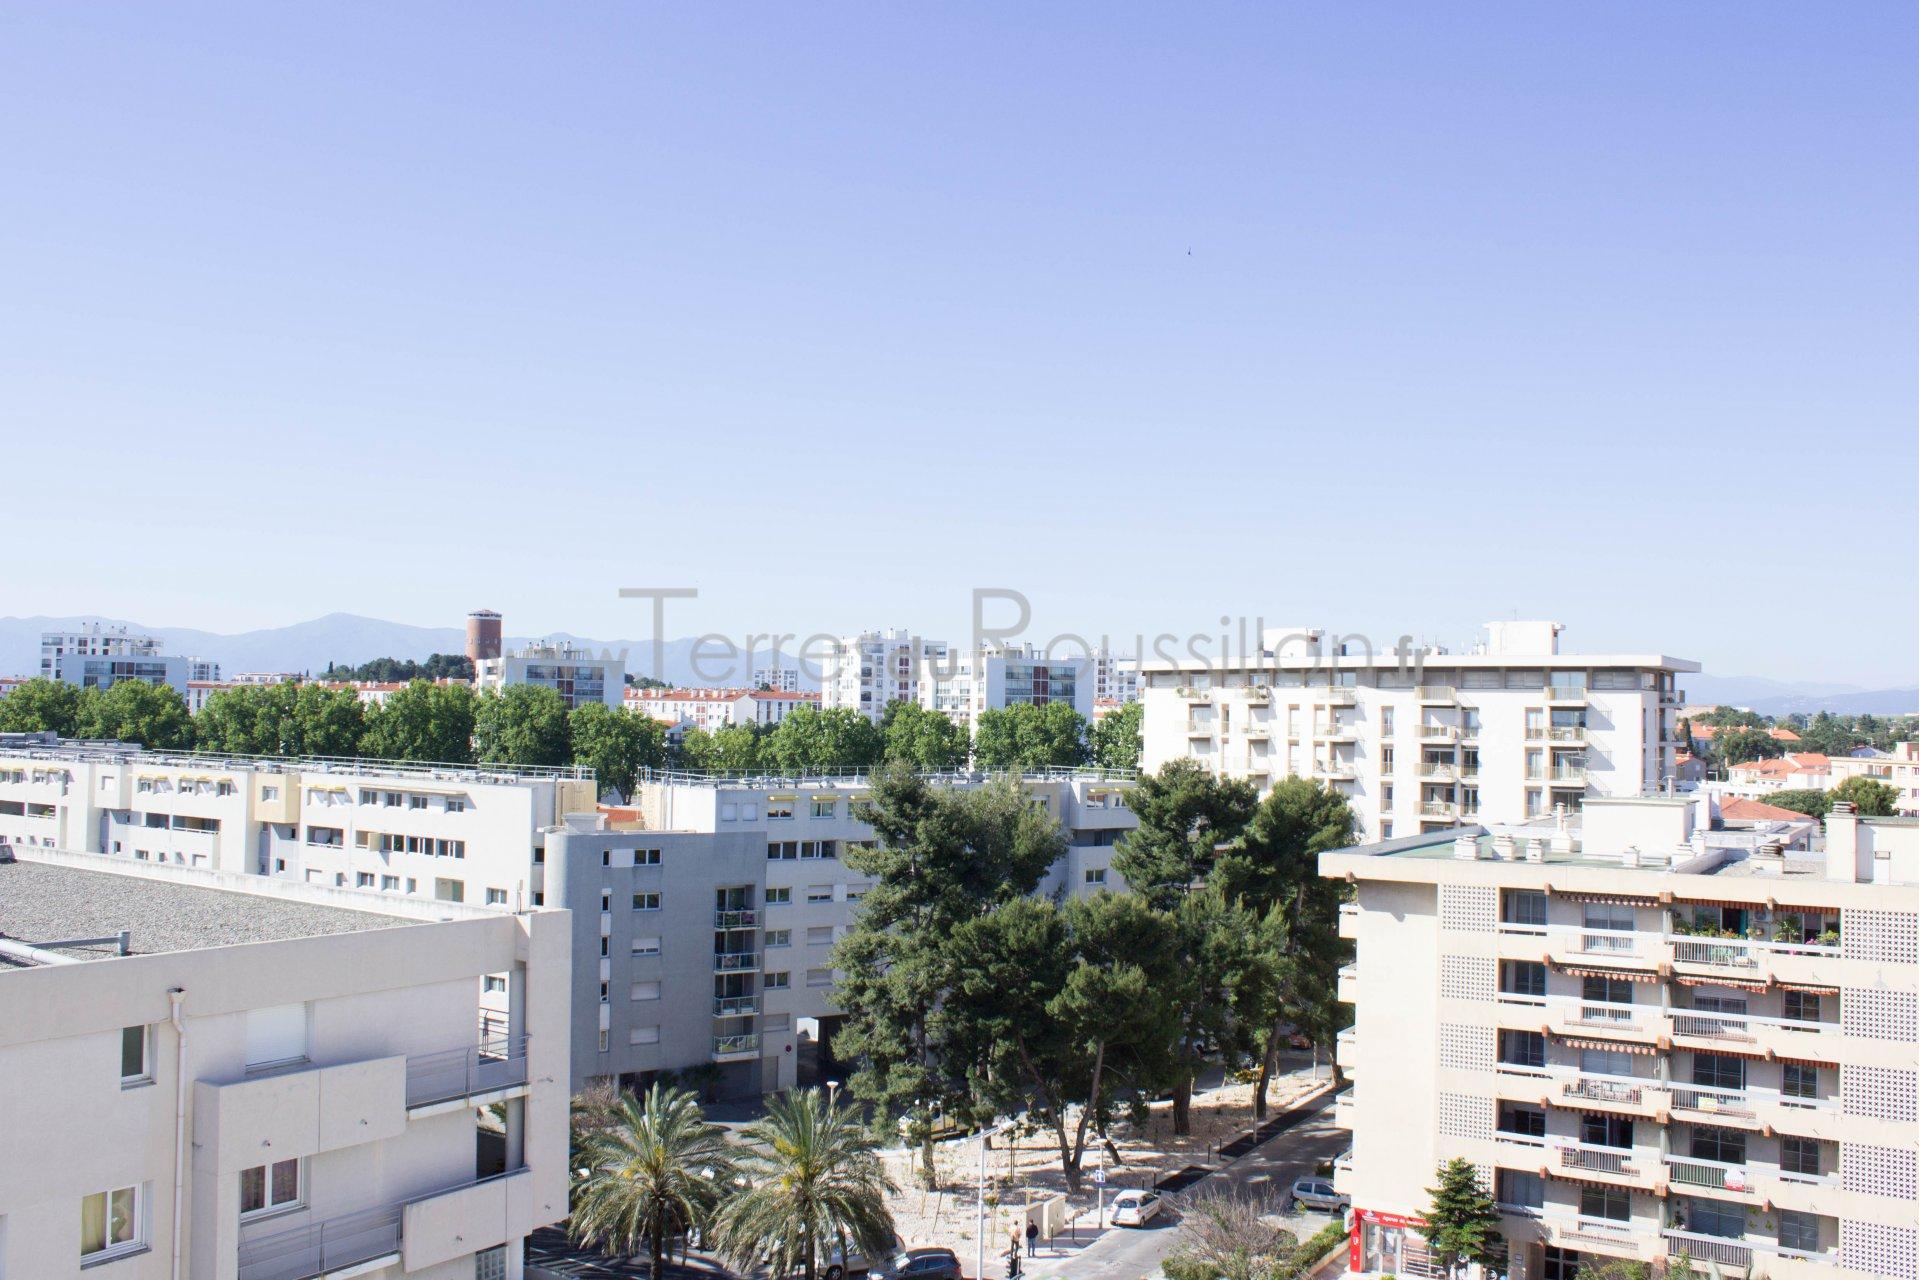 Apartment F2 of 55 m² sector La Lunette